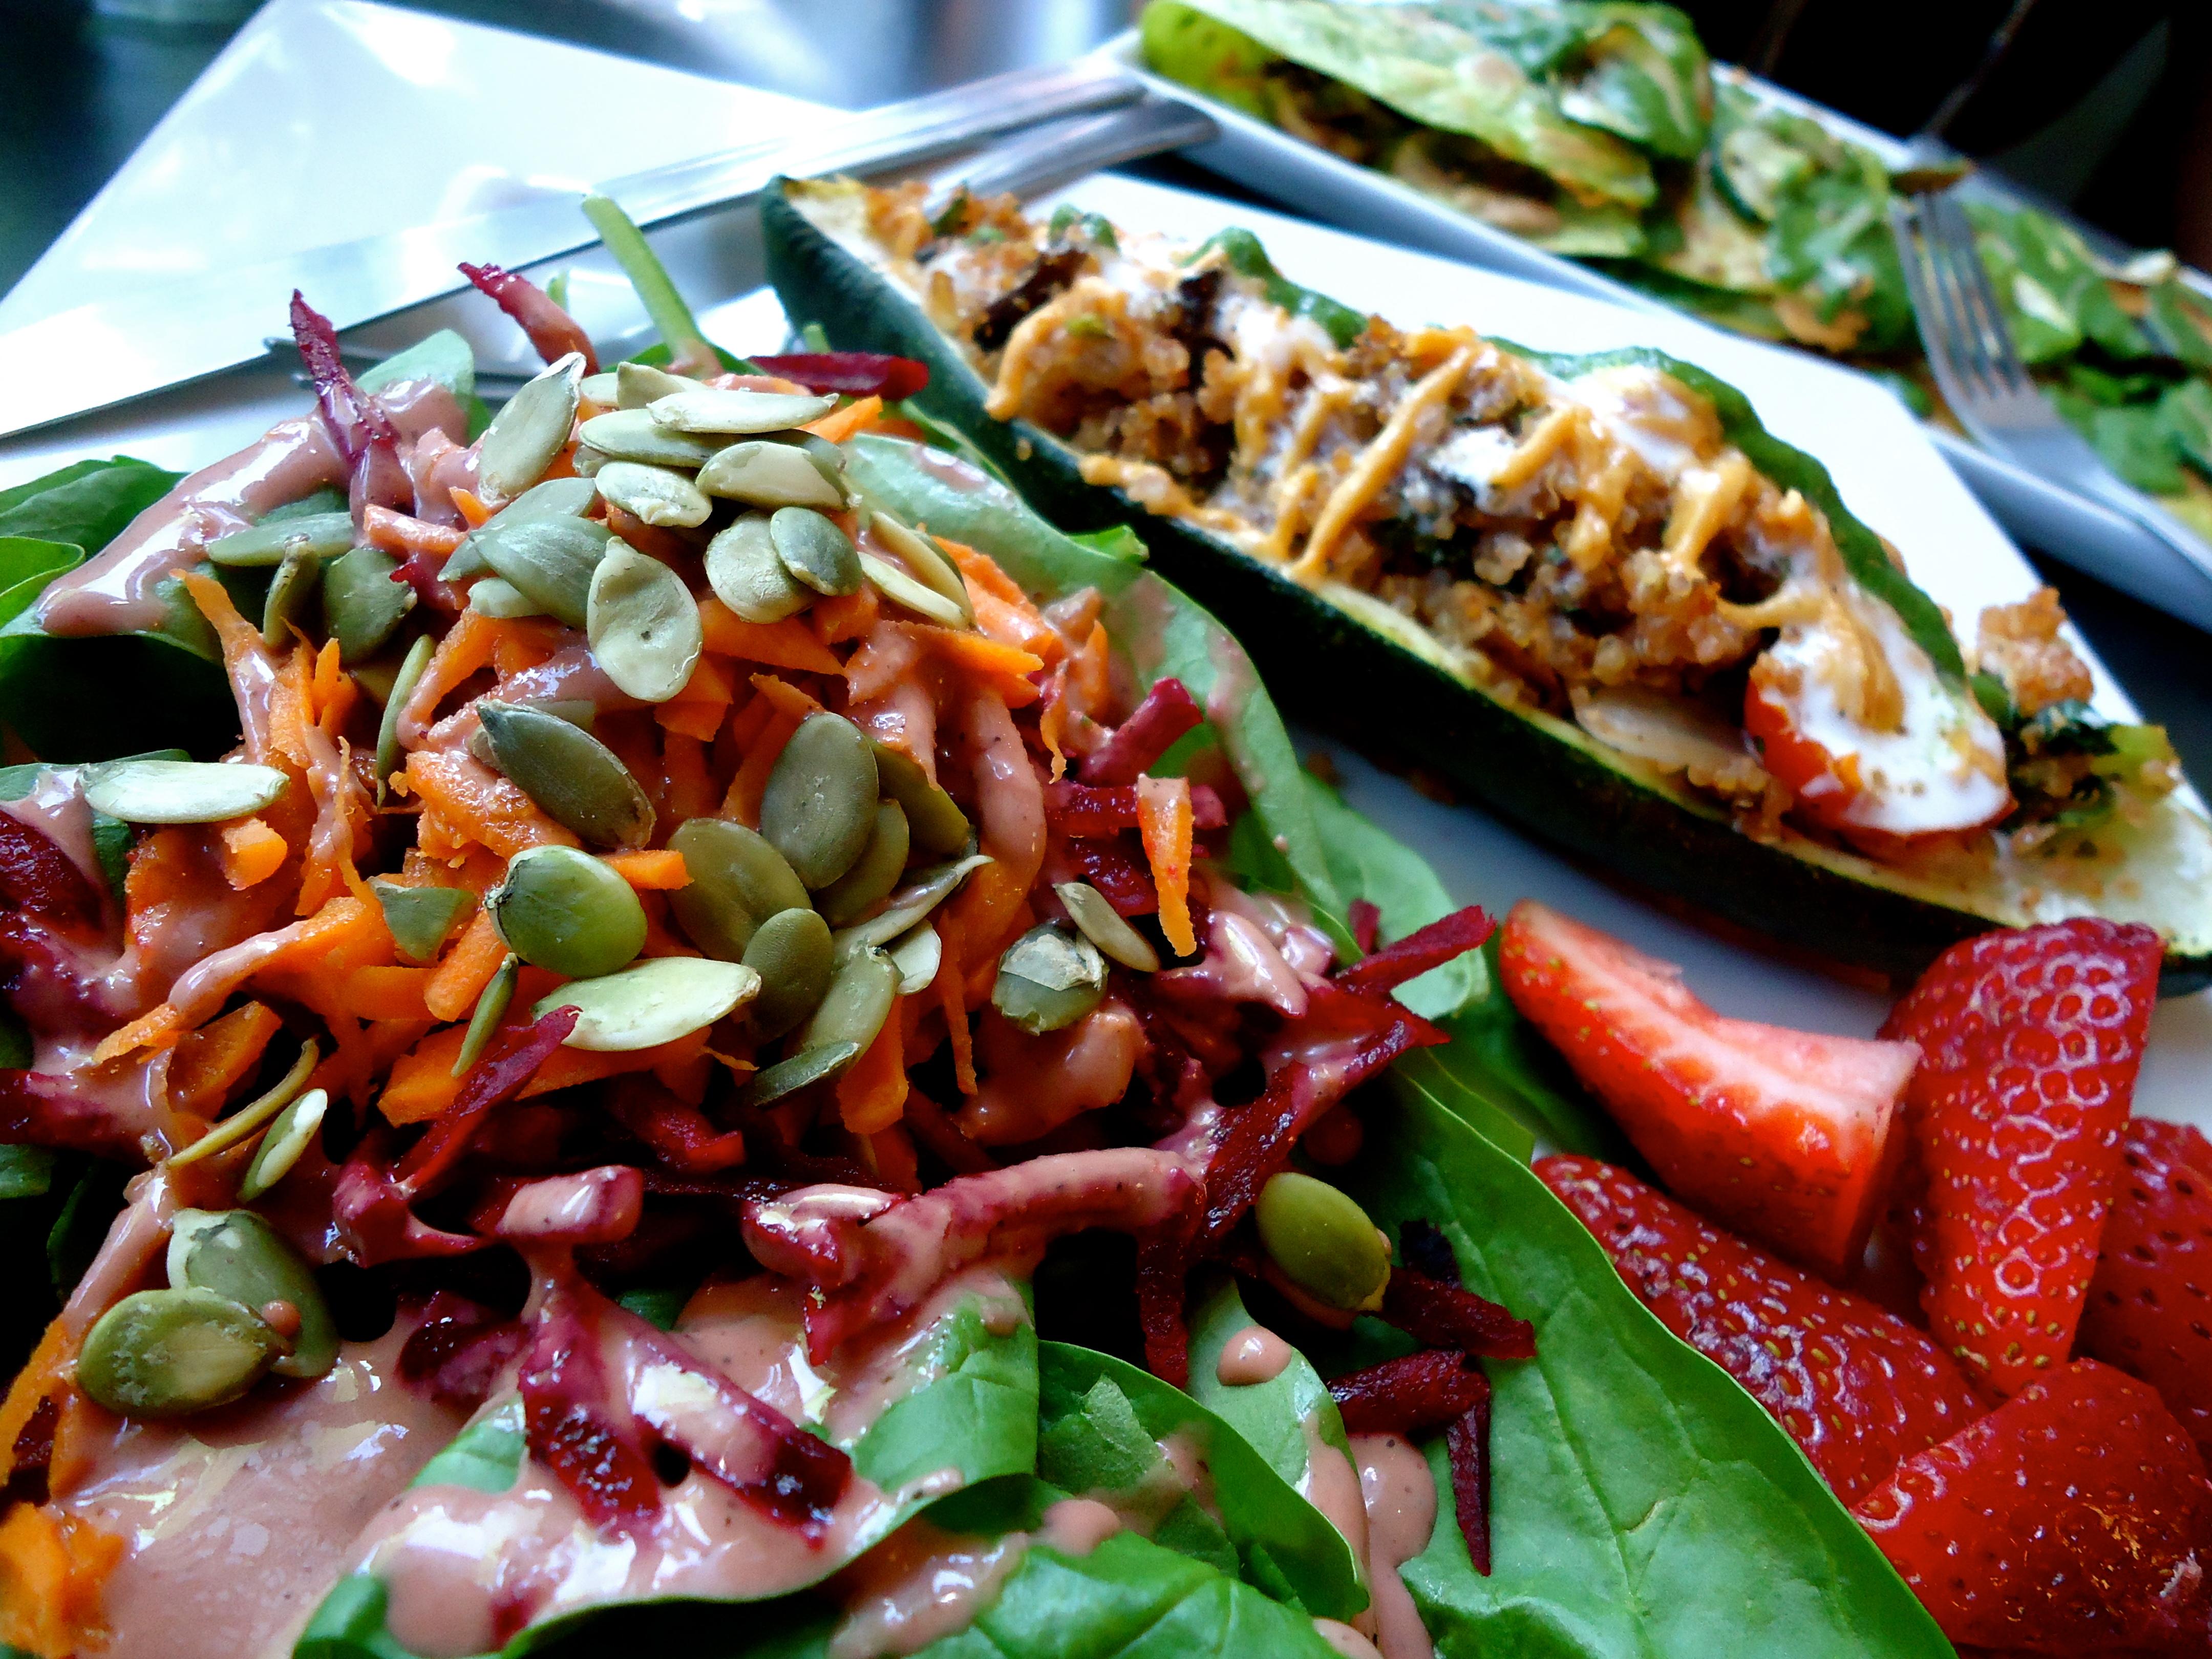 Vegan vegetarian food food art culture for Awesome cuisine categories vegetarian